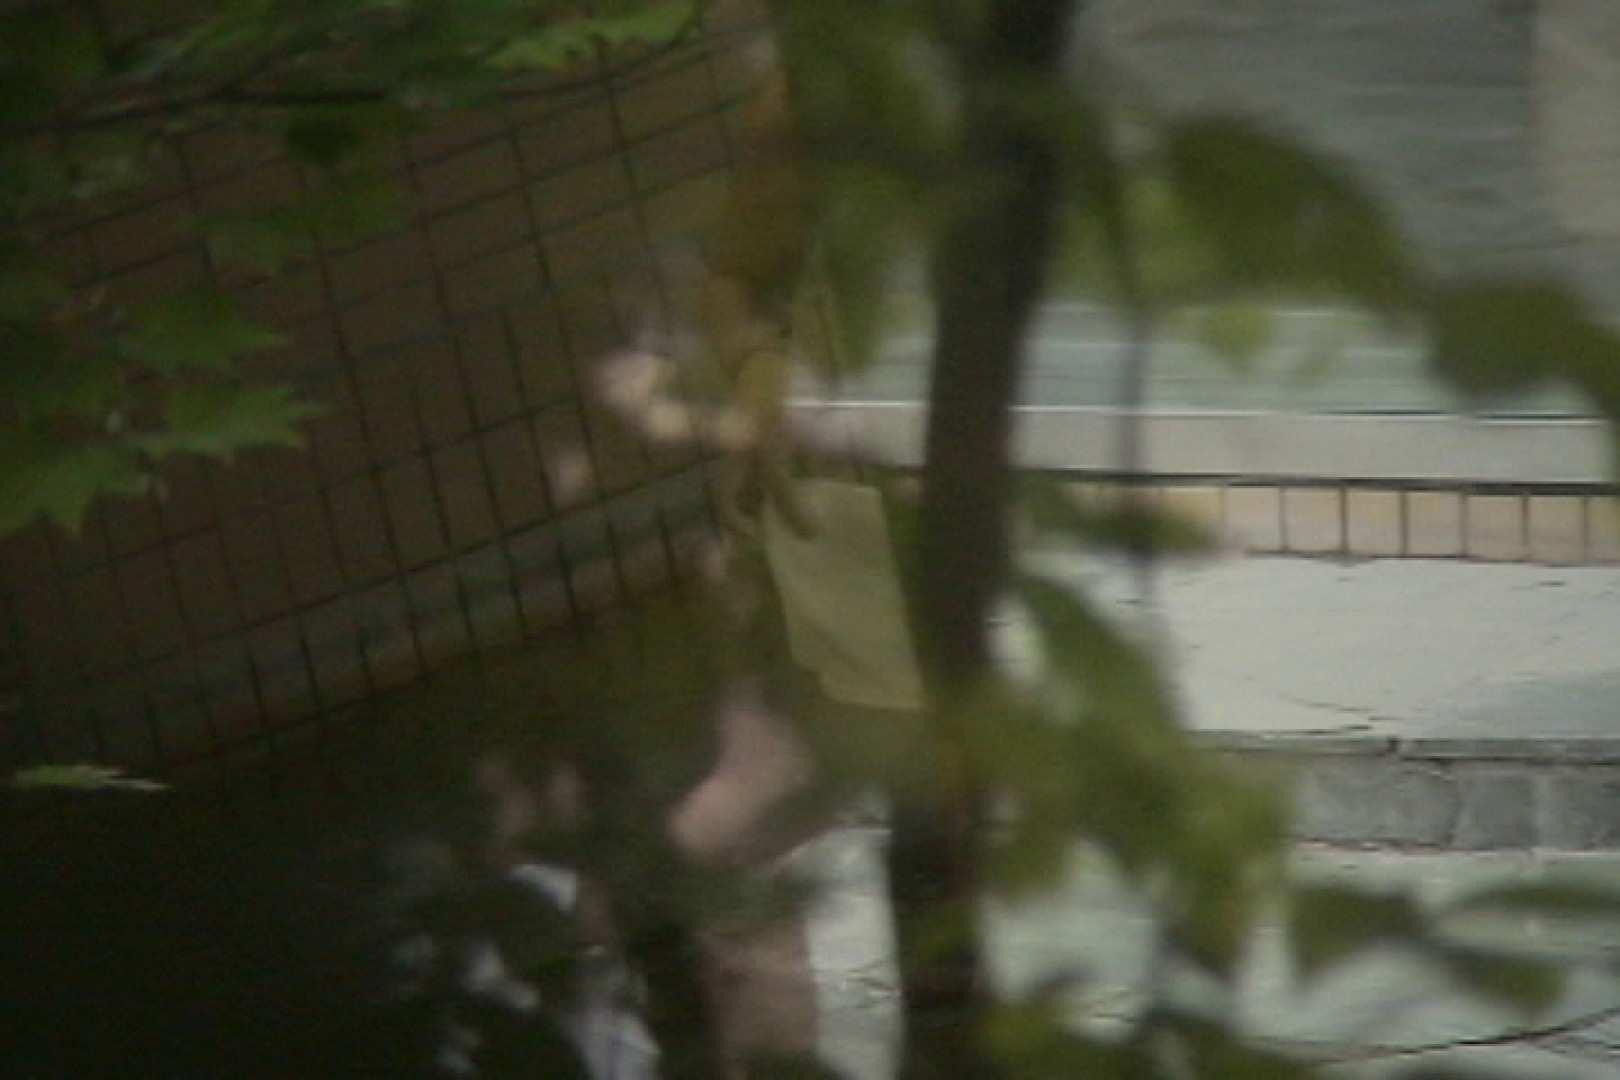 Aquaな露天風呂Vol.711 露天風呂突入 おまんこ無修正動画無料 97pic 89